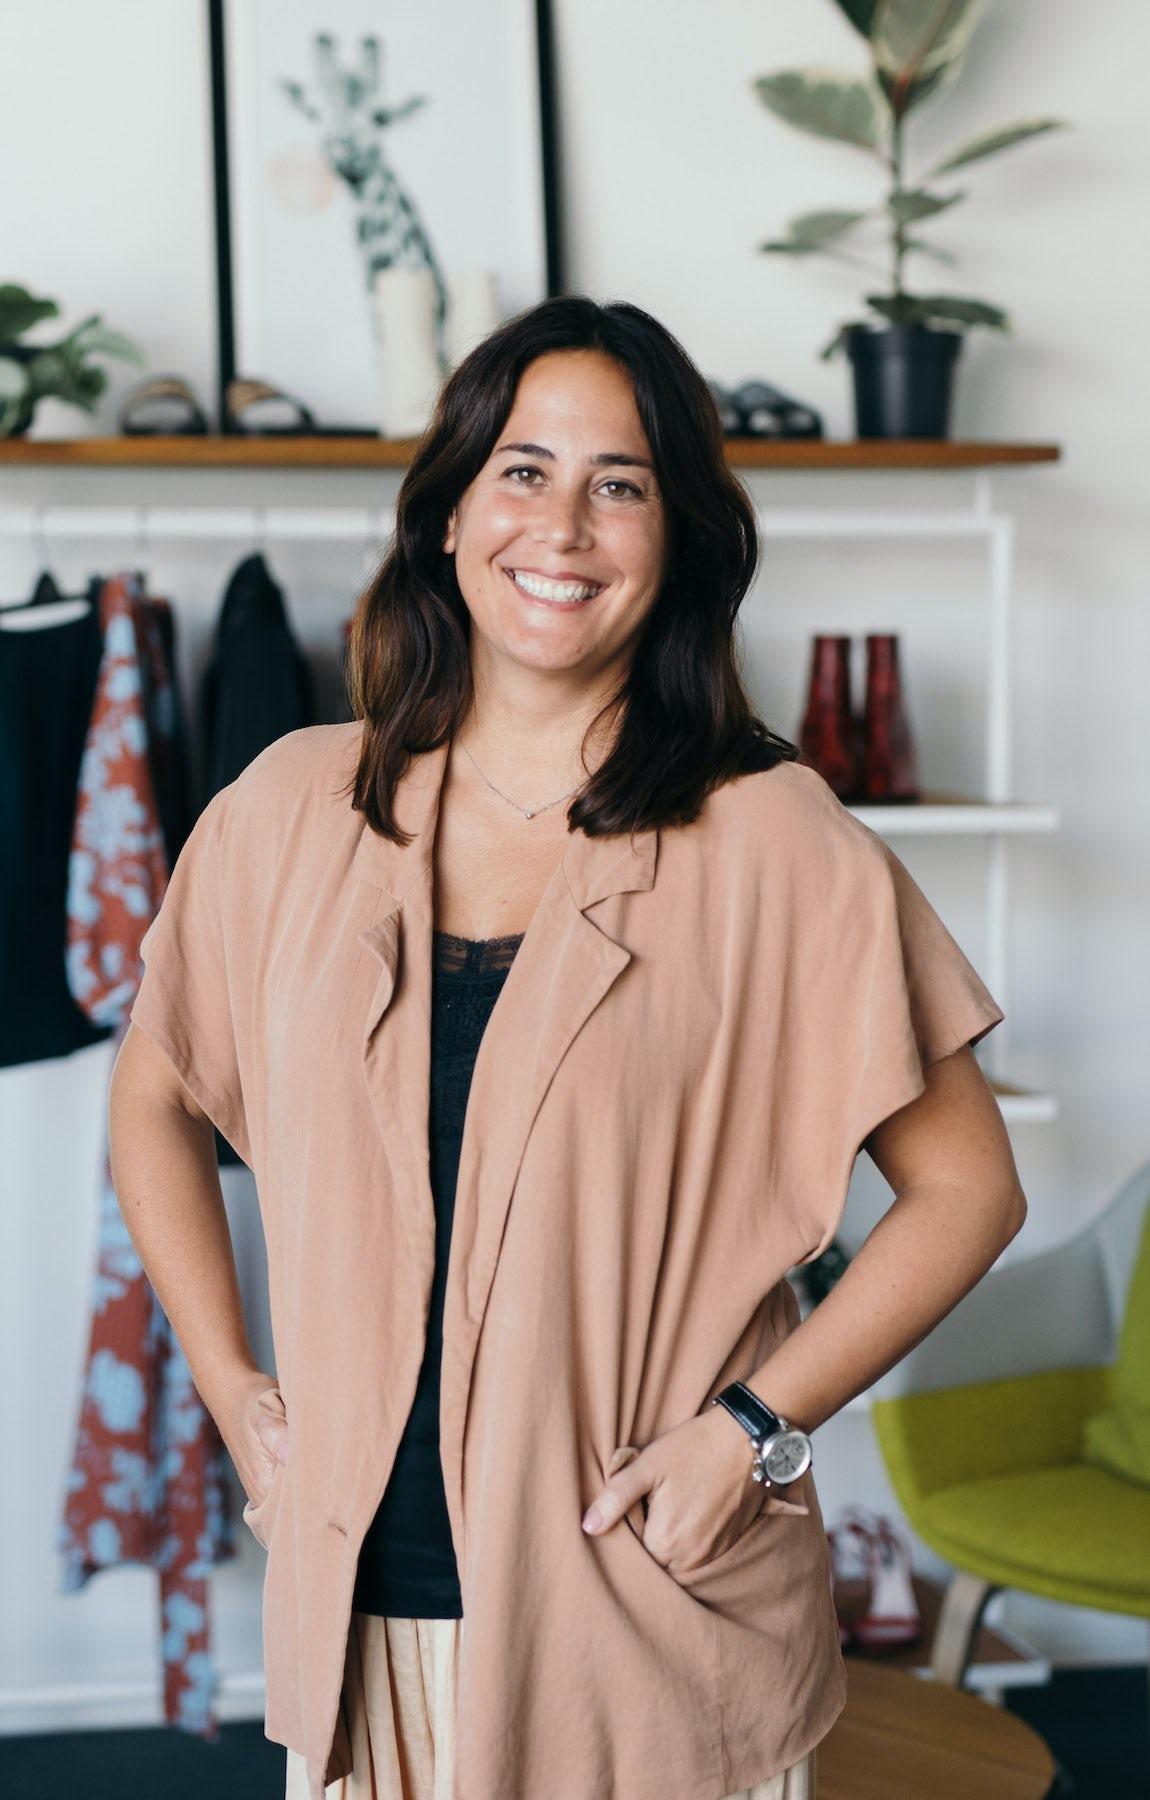 Sara Diez, Vice President of Womenswear | Source: Svenja Krueger for Zalando